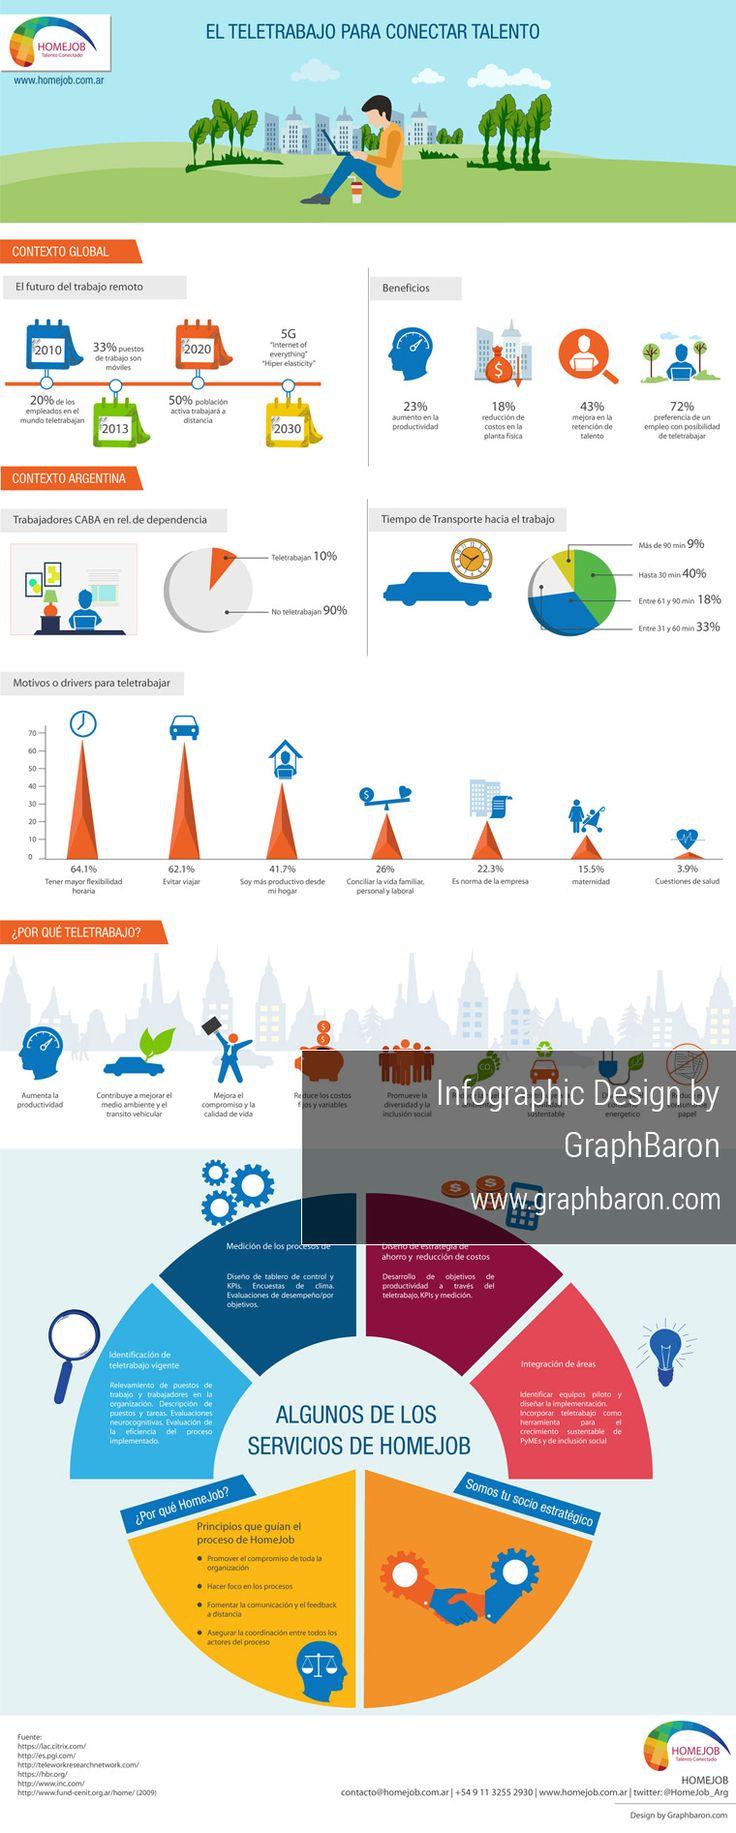 37 best Info-graphic Design Services images on Pinterest | Design ...